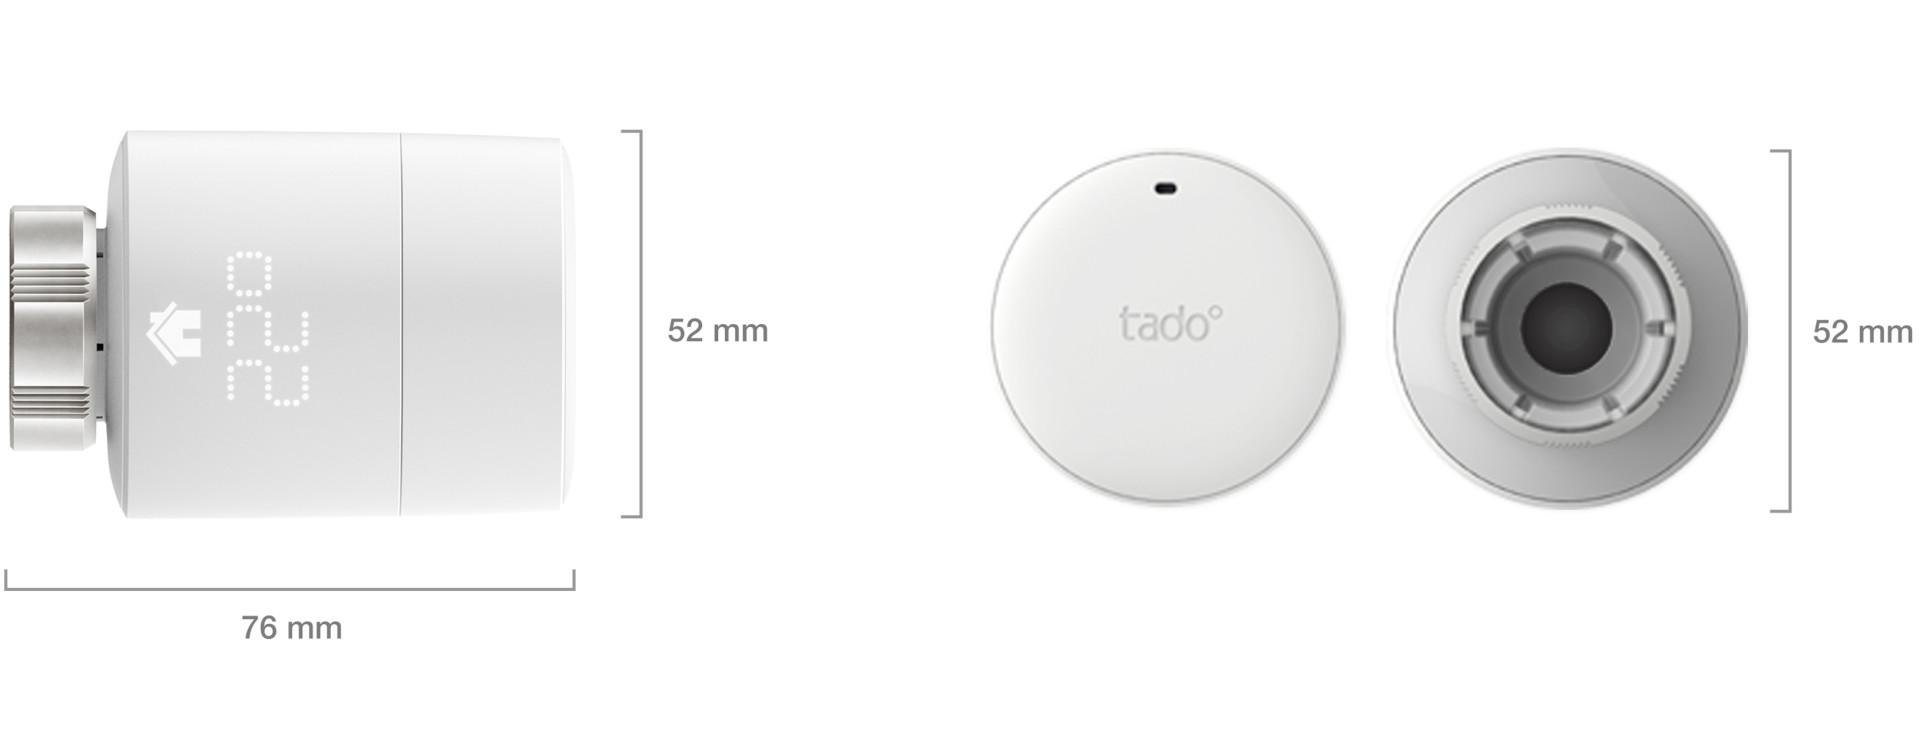 Smart Radiator Thermostat dimensions